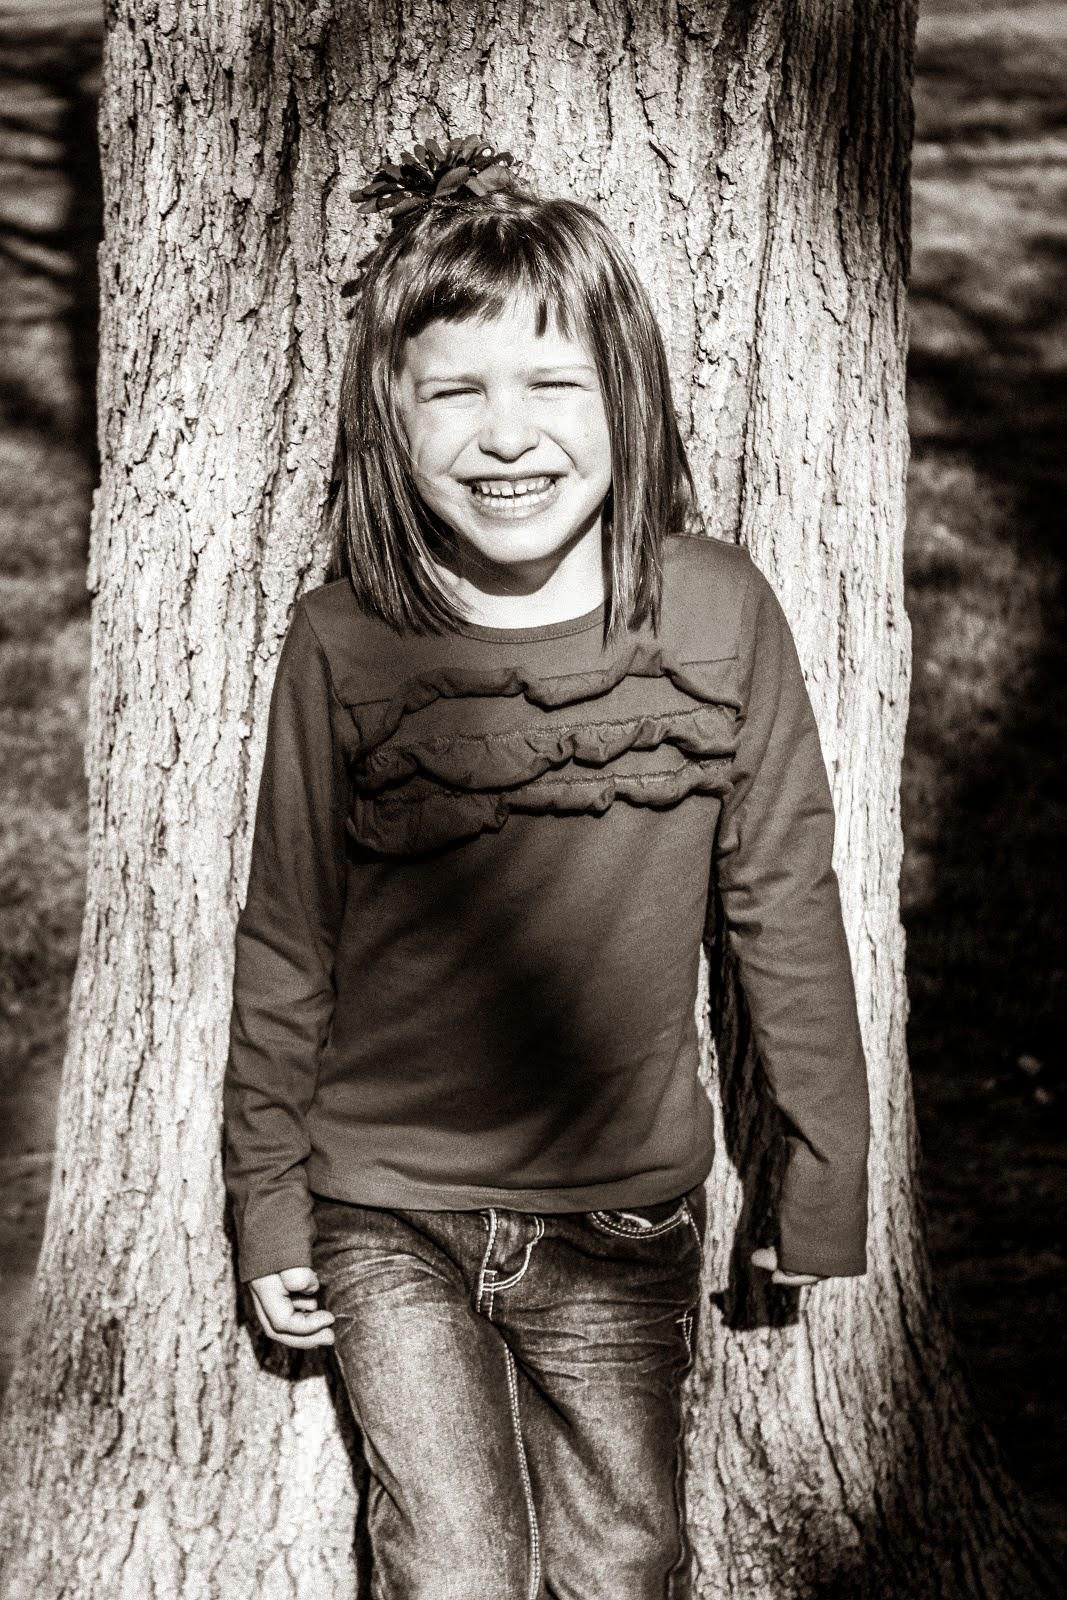 Kanyon age 5